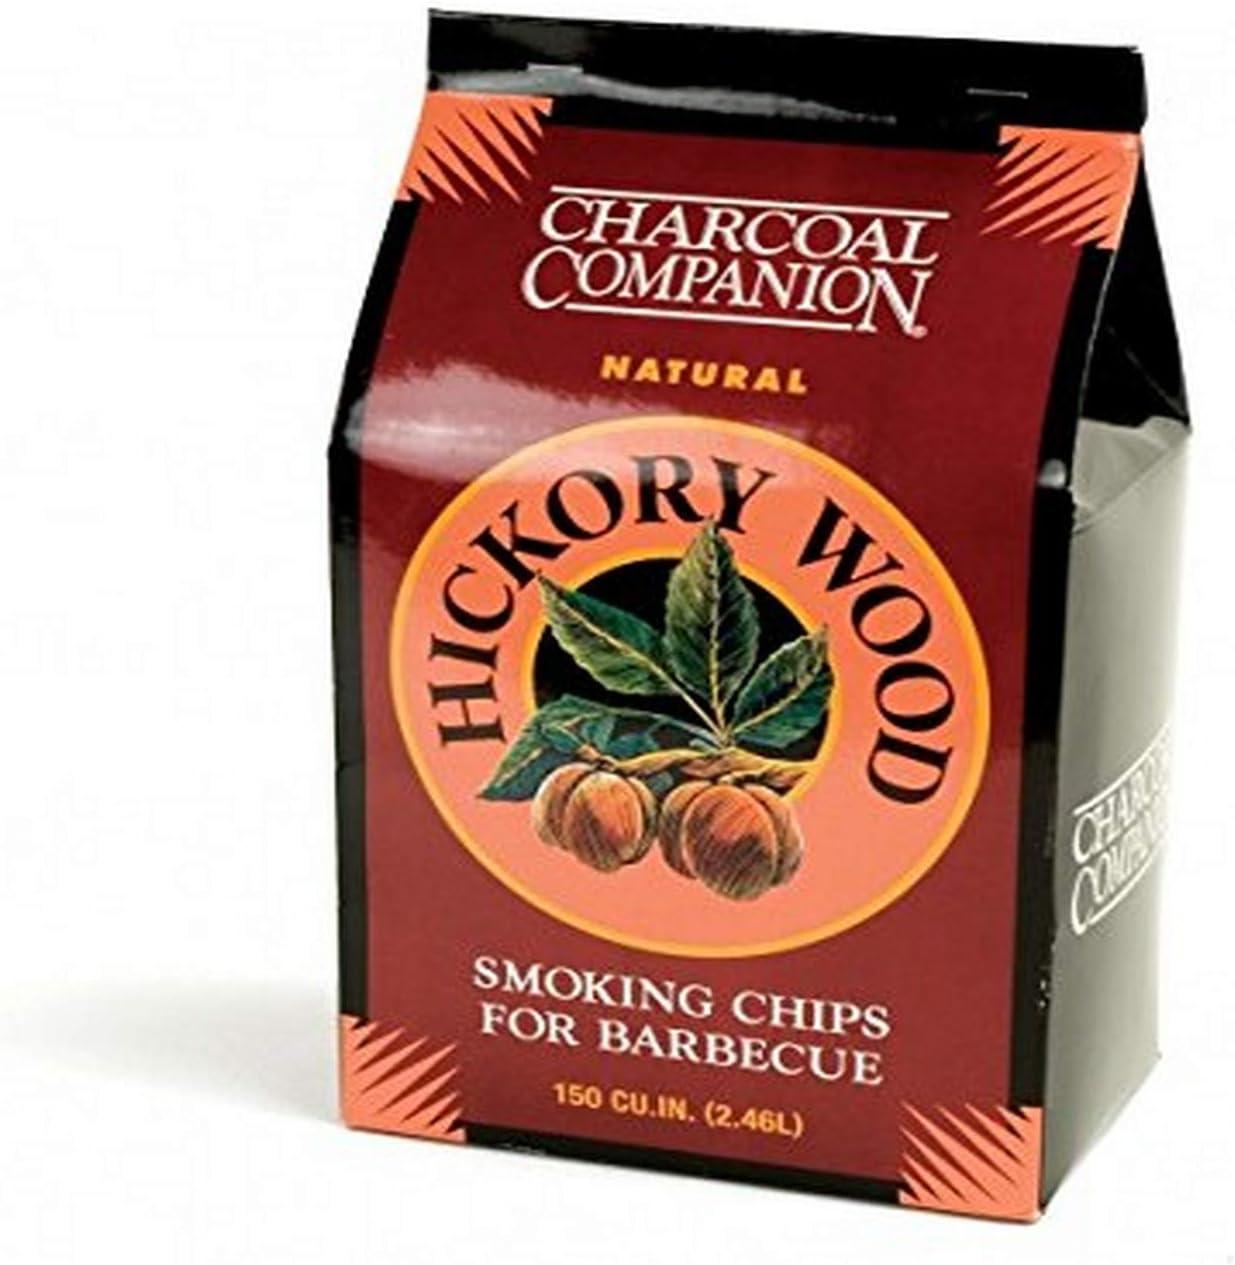 B000I1YBAQ Charcoal Companion Hickory Wood Smoking Chips 616pHMtT68L